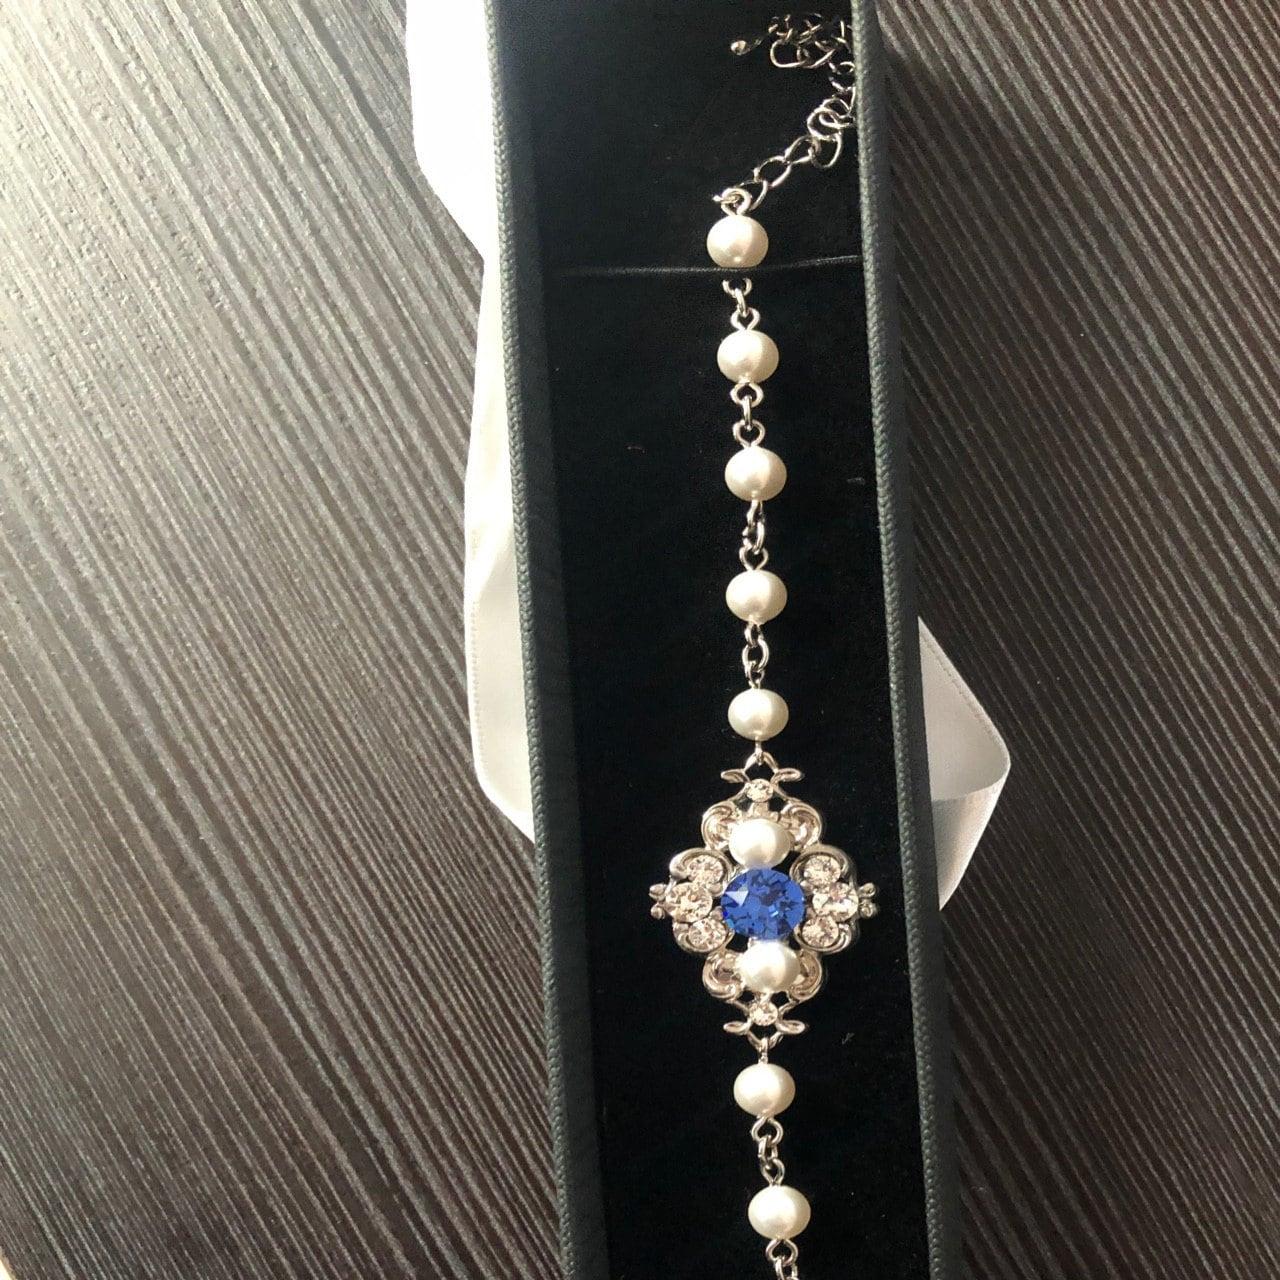 Sabita Stöckle added a photo of their purchase